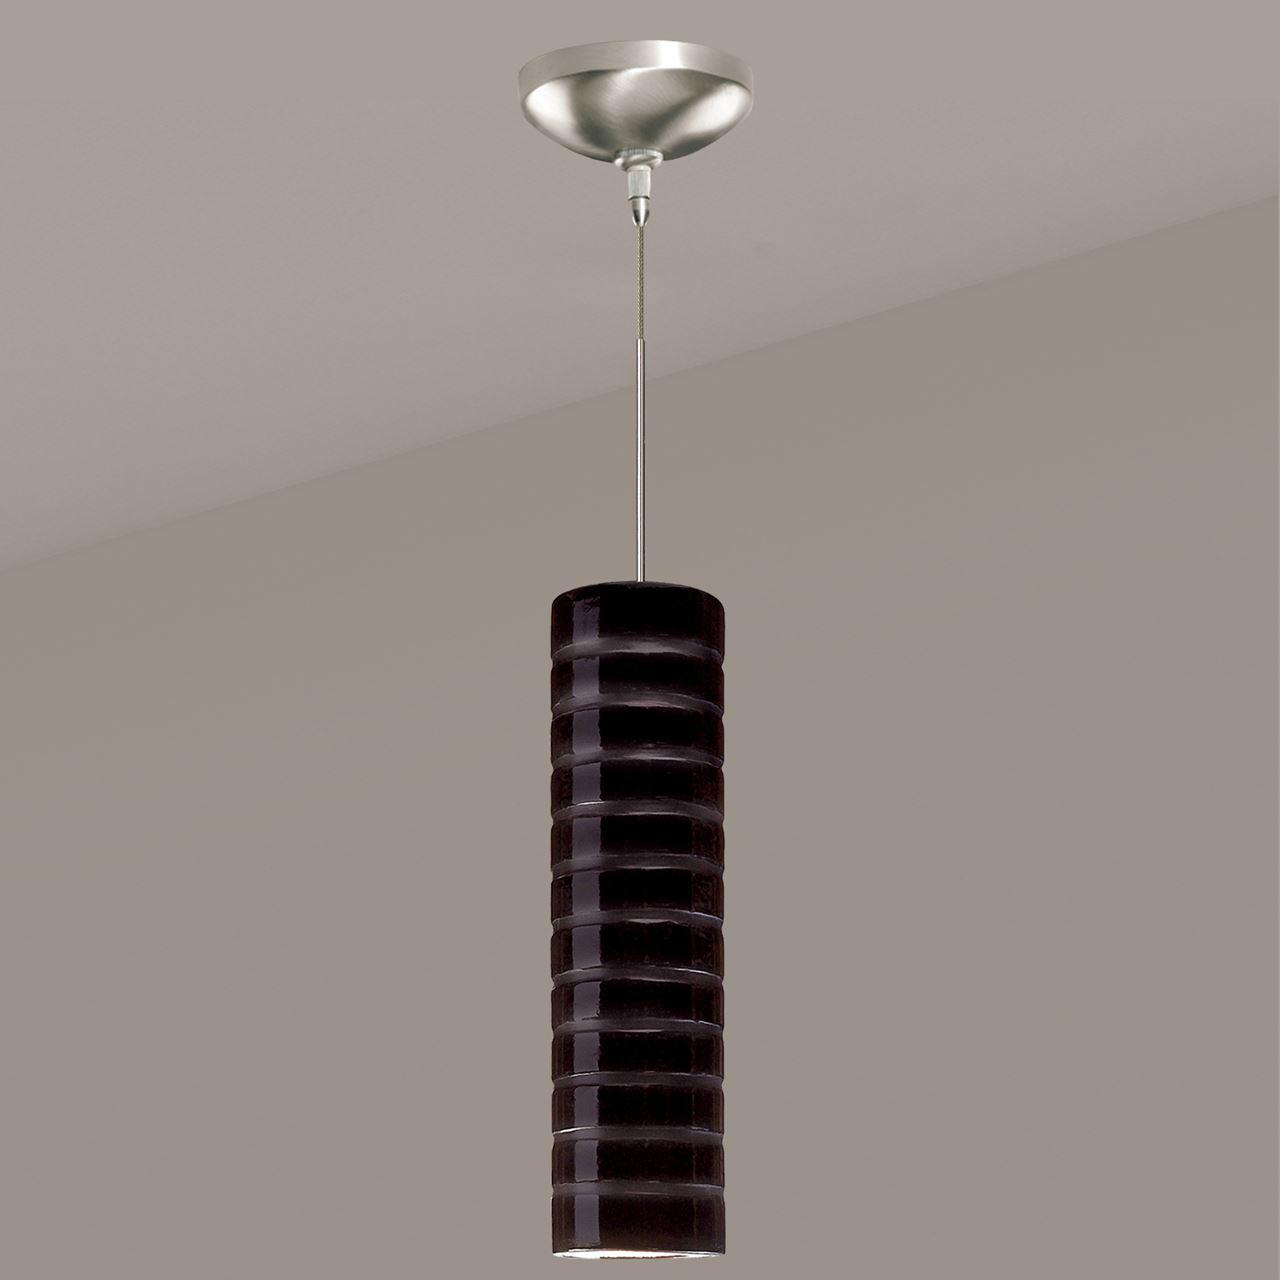 Picture of A19 Ceramic Pendant Light | Strata